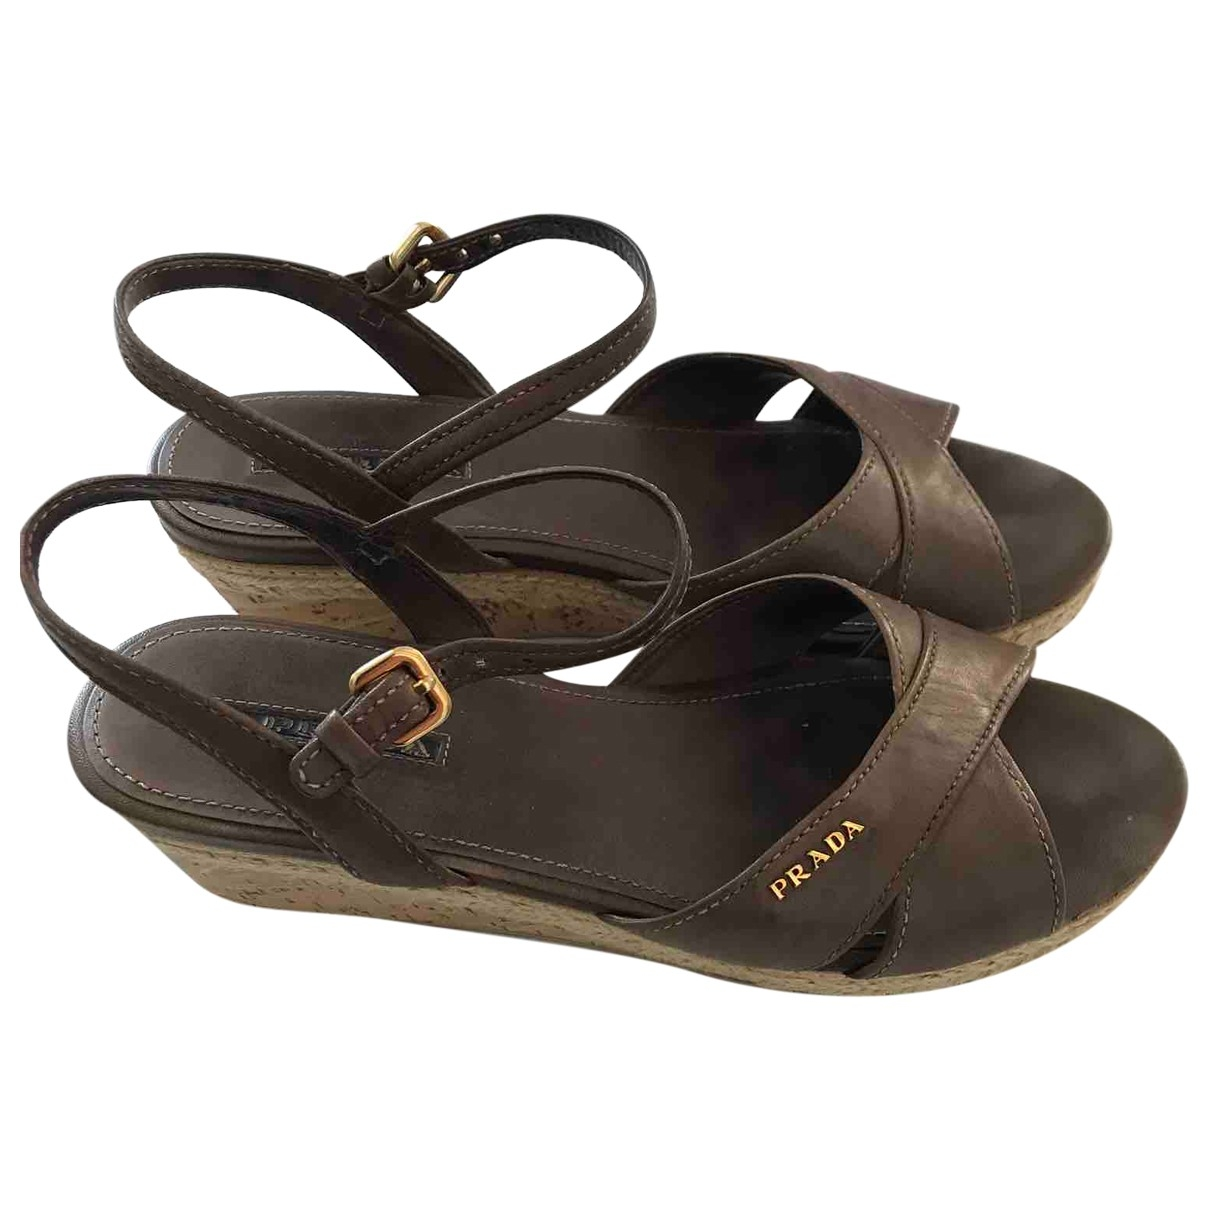 Prada \N Brown Leather Sandals for Women 38.5 EU